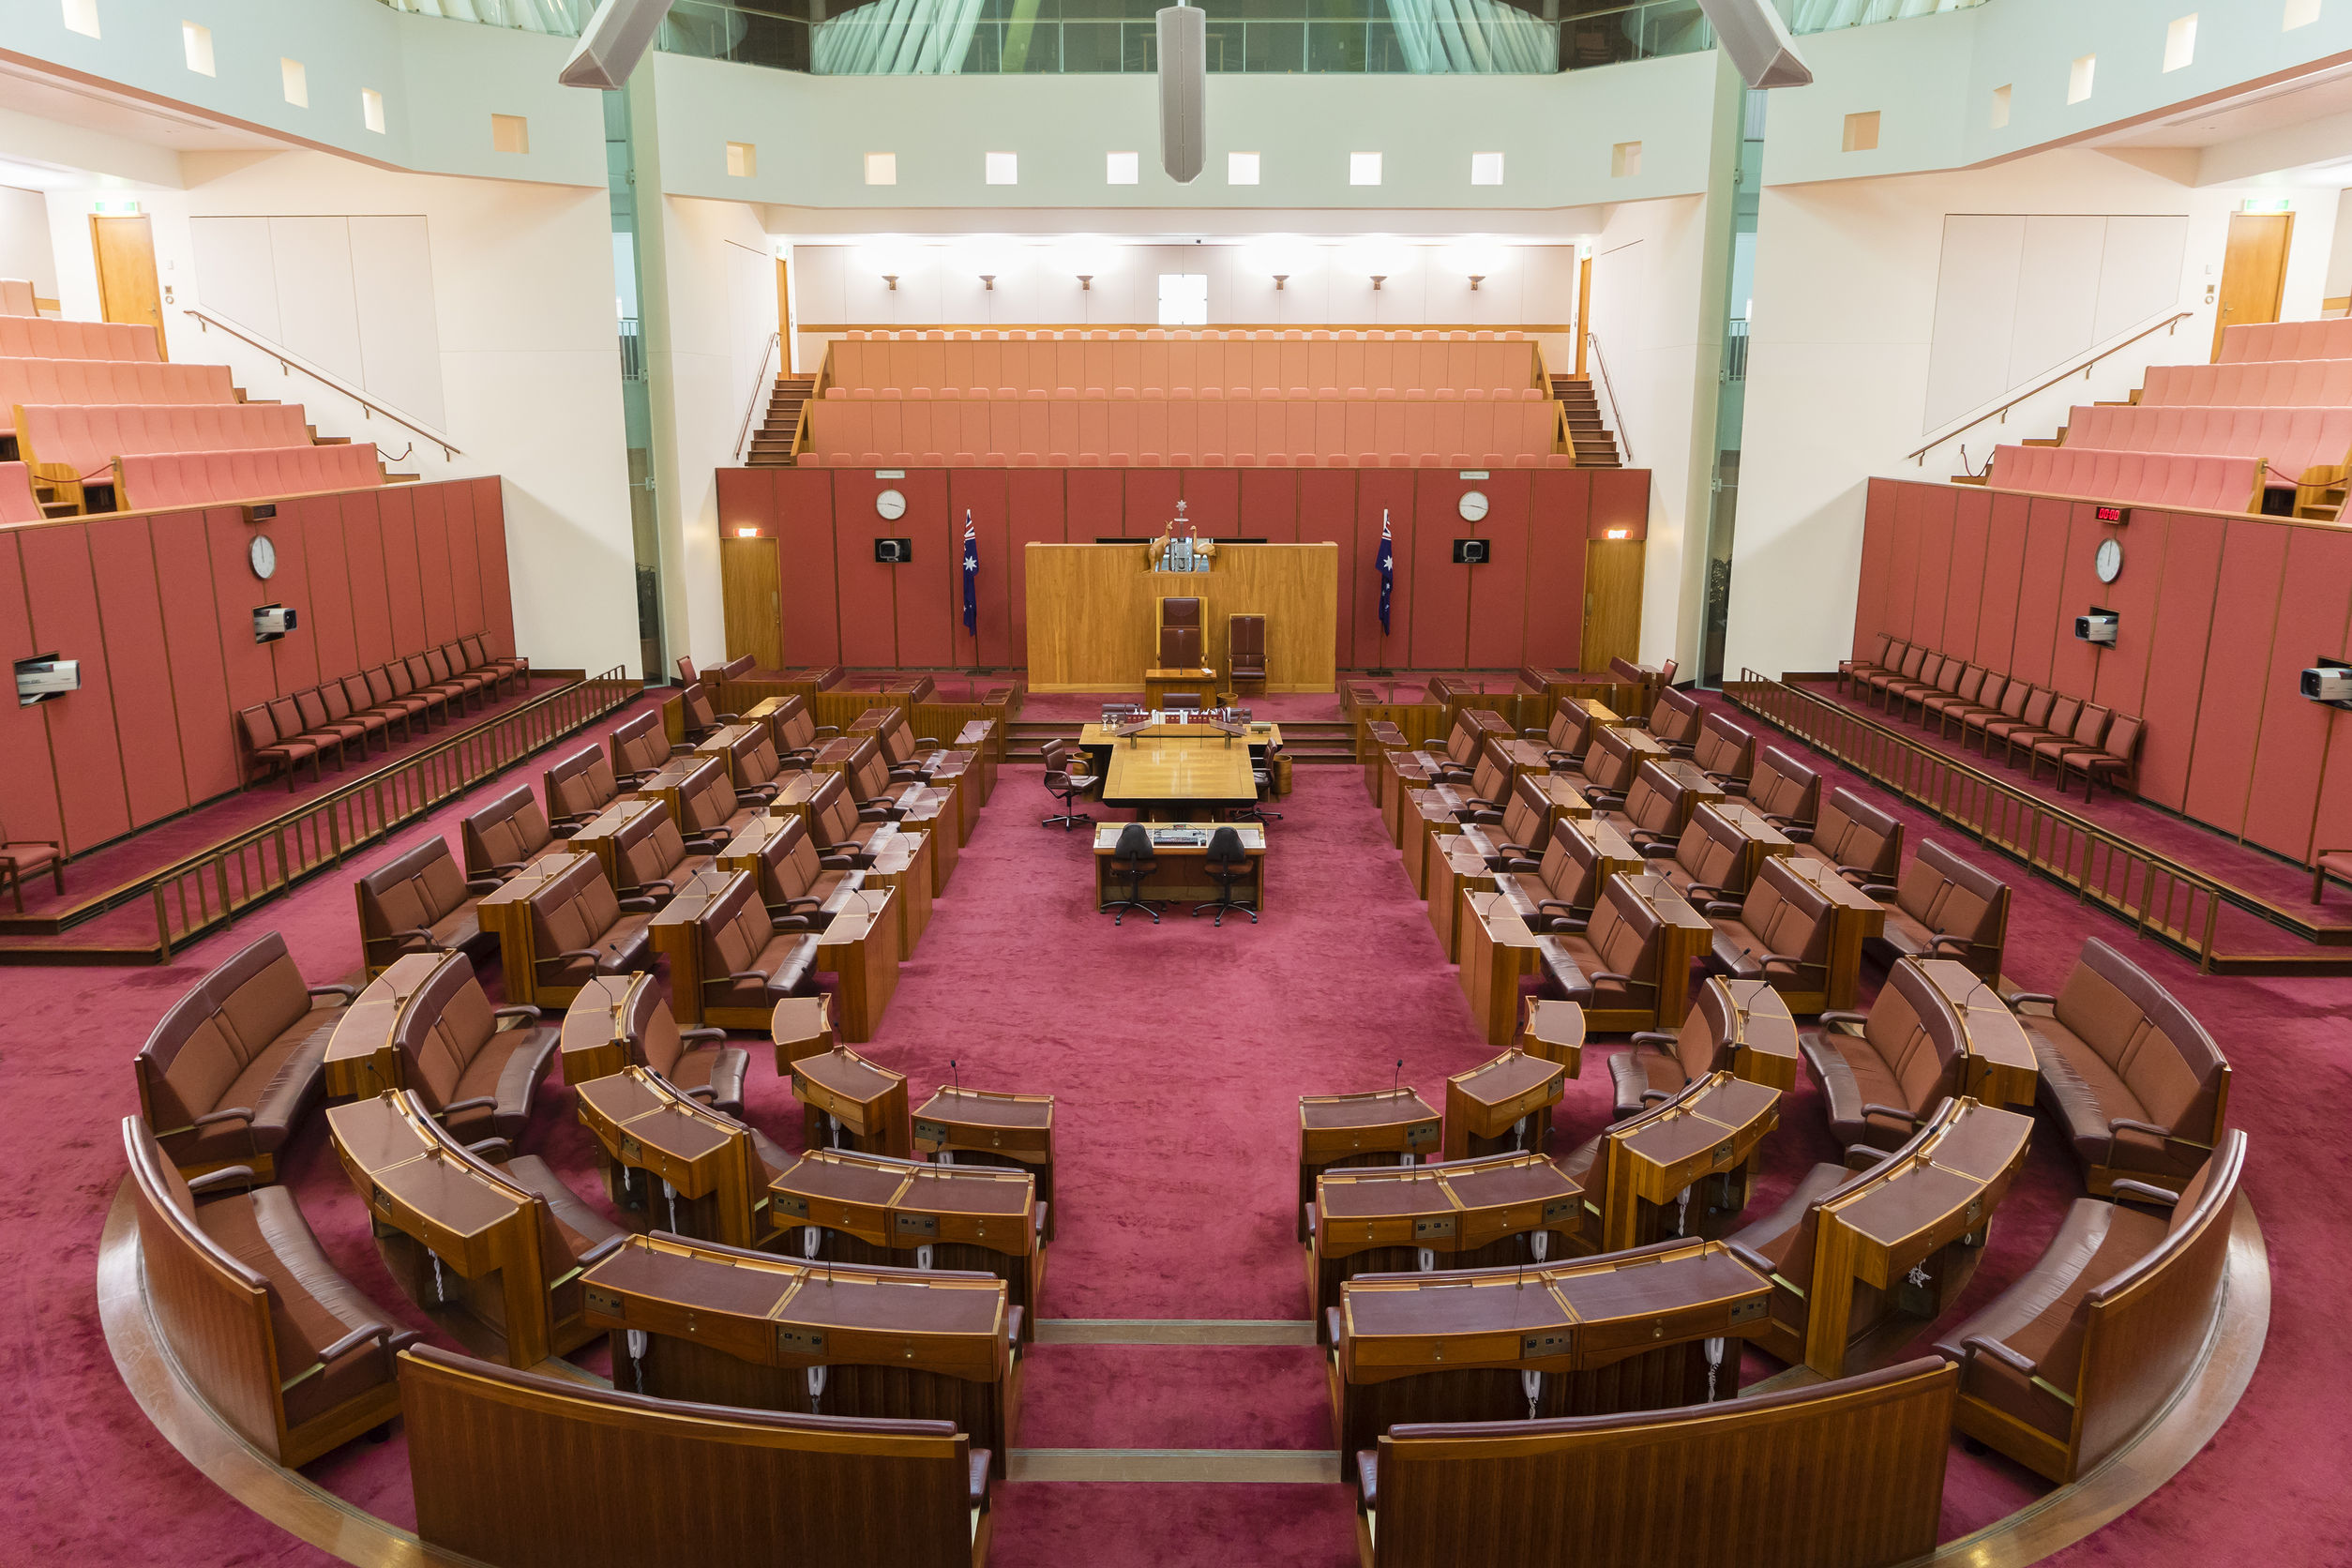 Kristina Keneally puts her hand up for Sam Dastyari's Senate